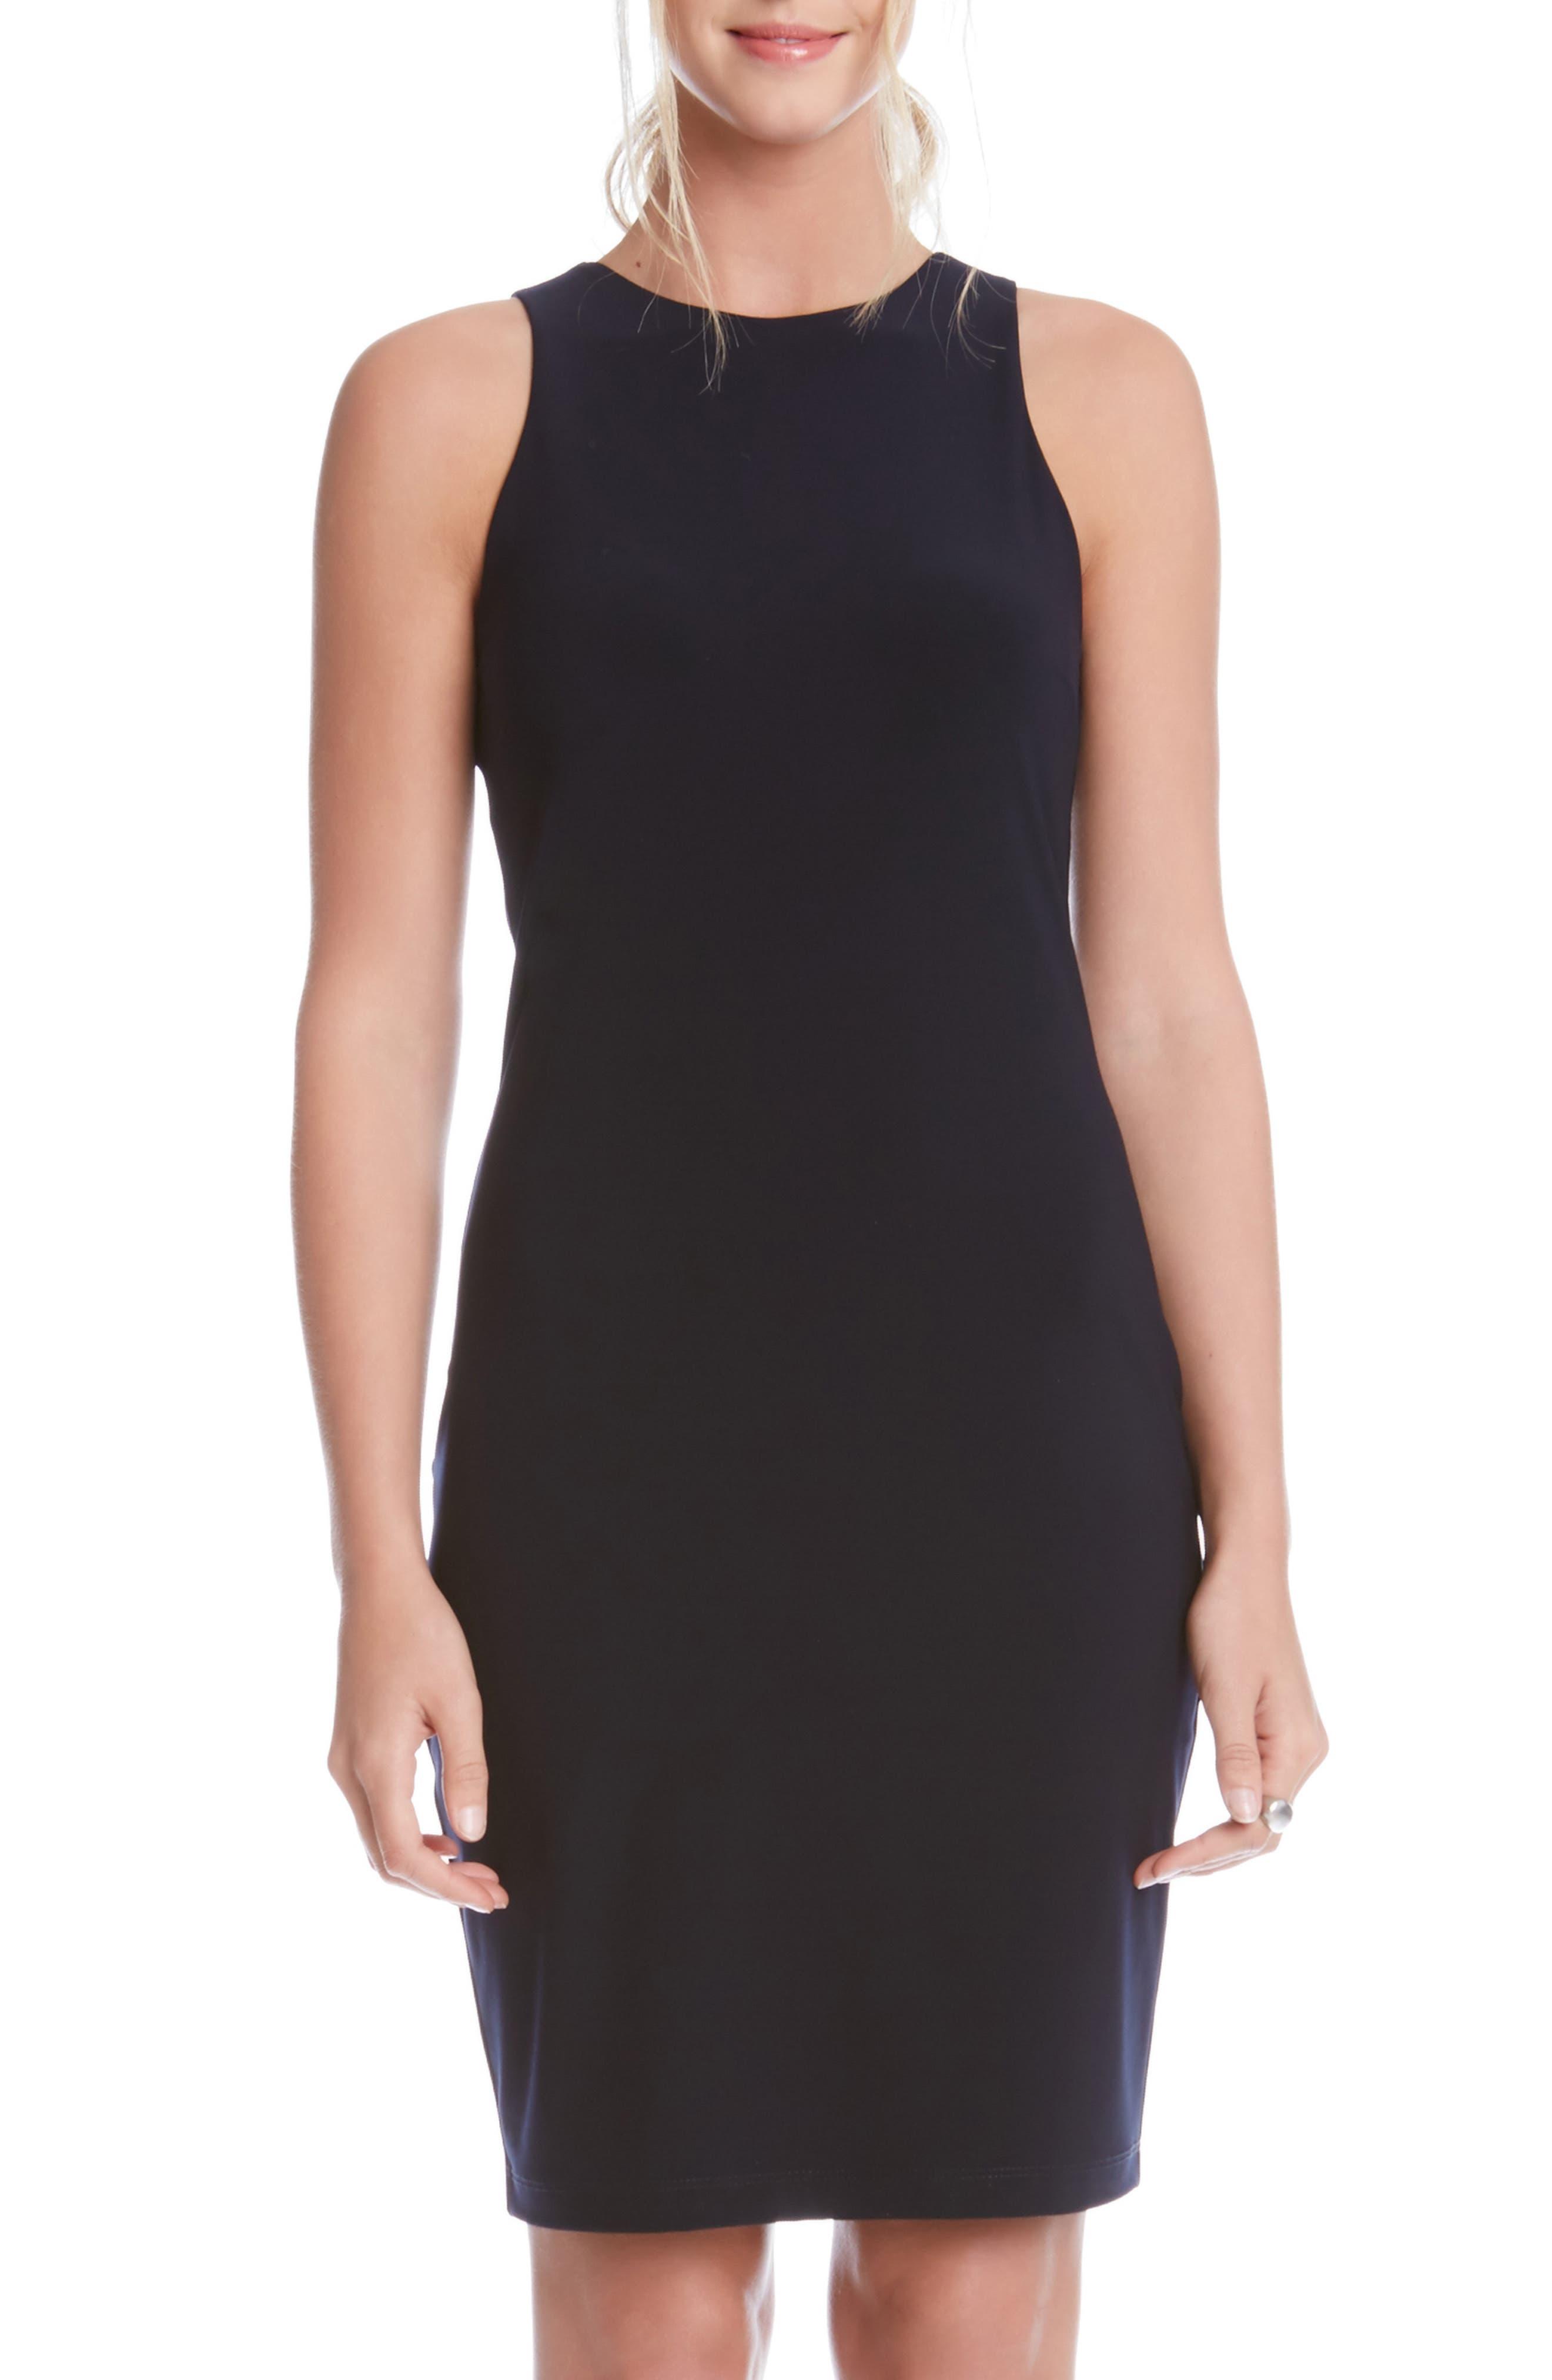 Alternate Image 1 Selected - Karen Kane Sleeveless Sheath Dress